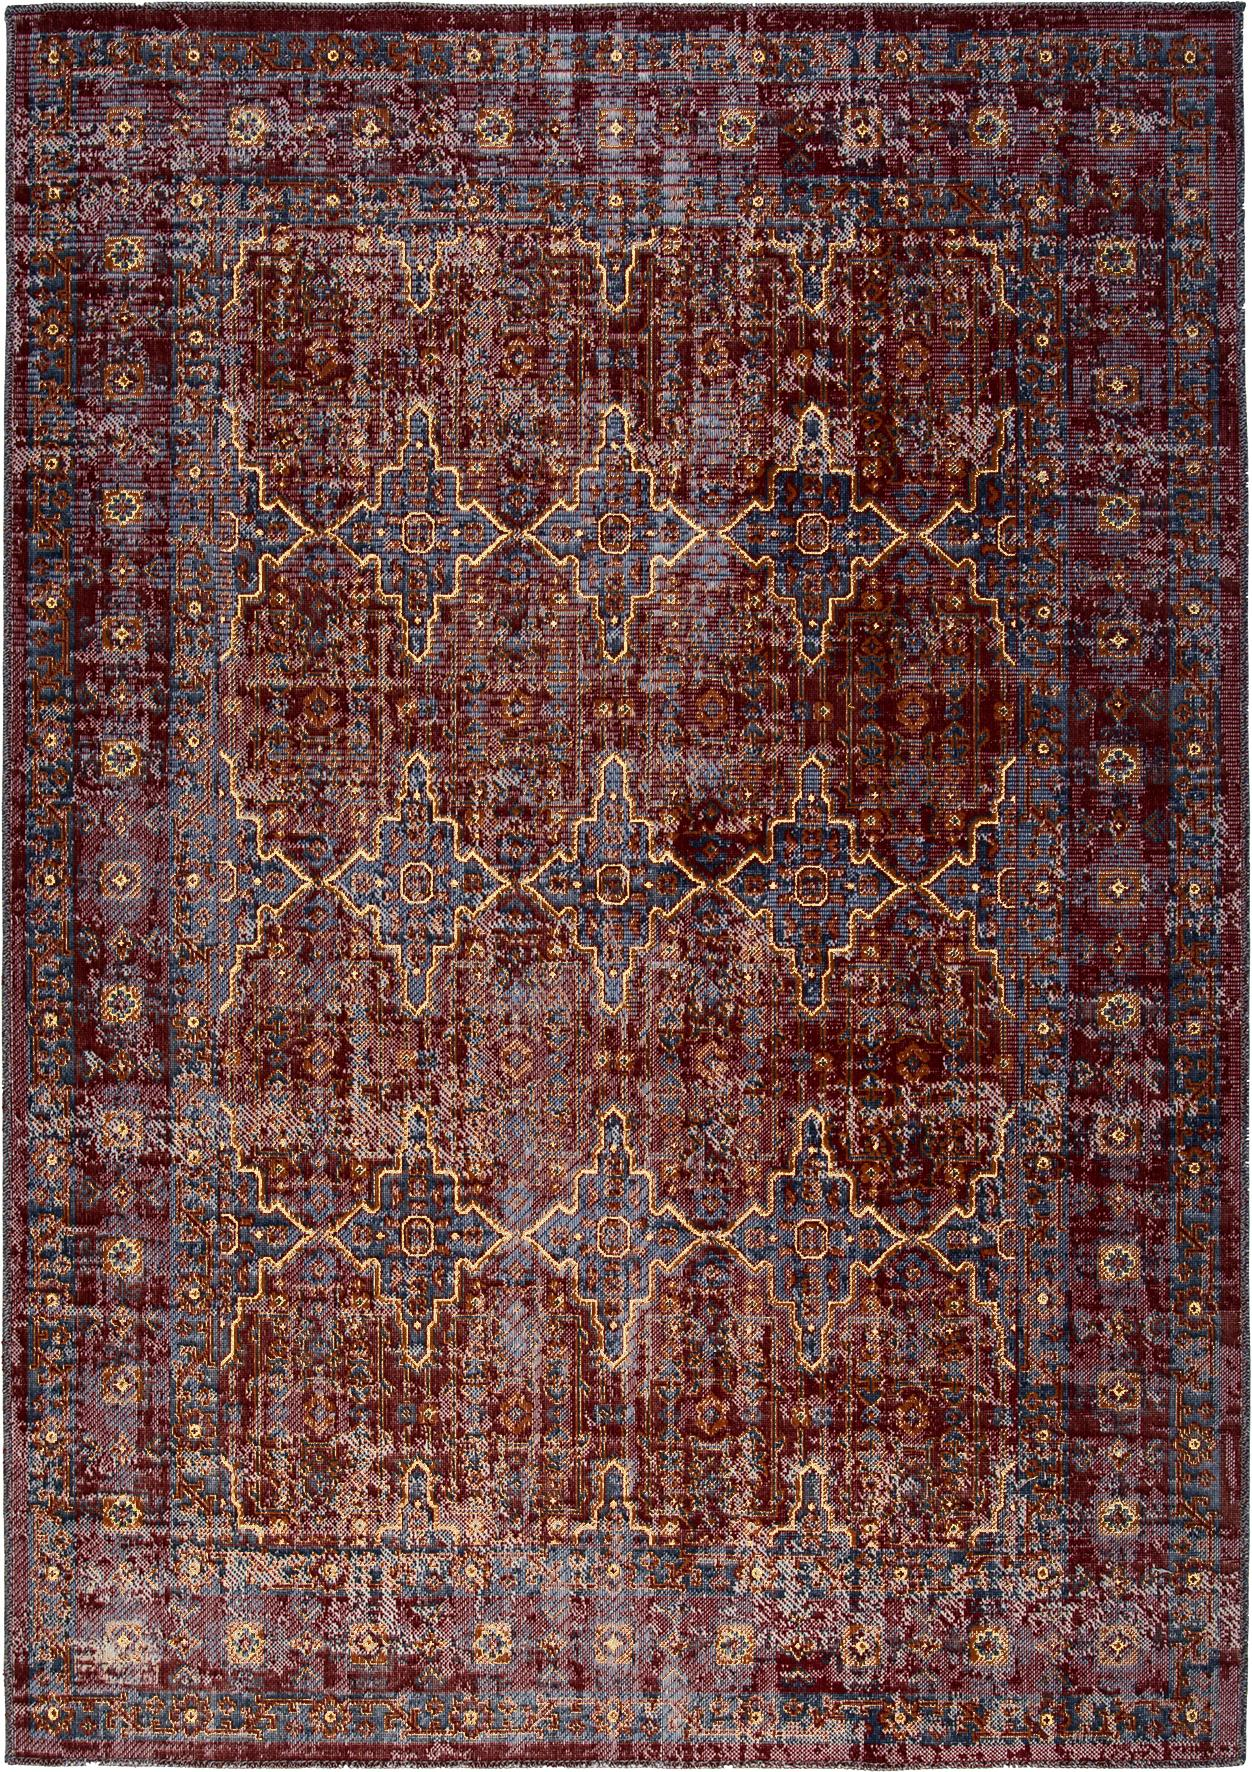 In- & Outdoor-Teppich Tilas Izmir in Dunkelrot, Orient Style, Dunkelrot, Senfgelb, Khaki, B 120 x L 170 cm (Größe S)